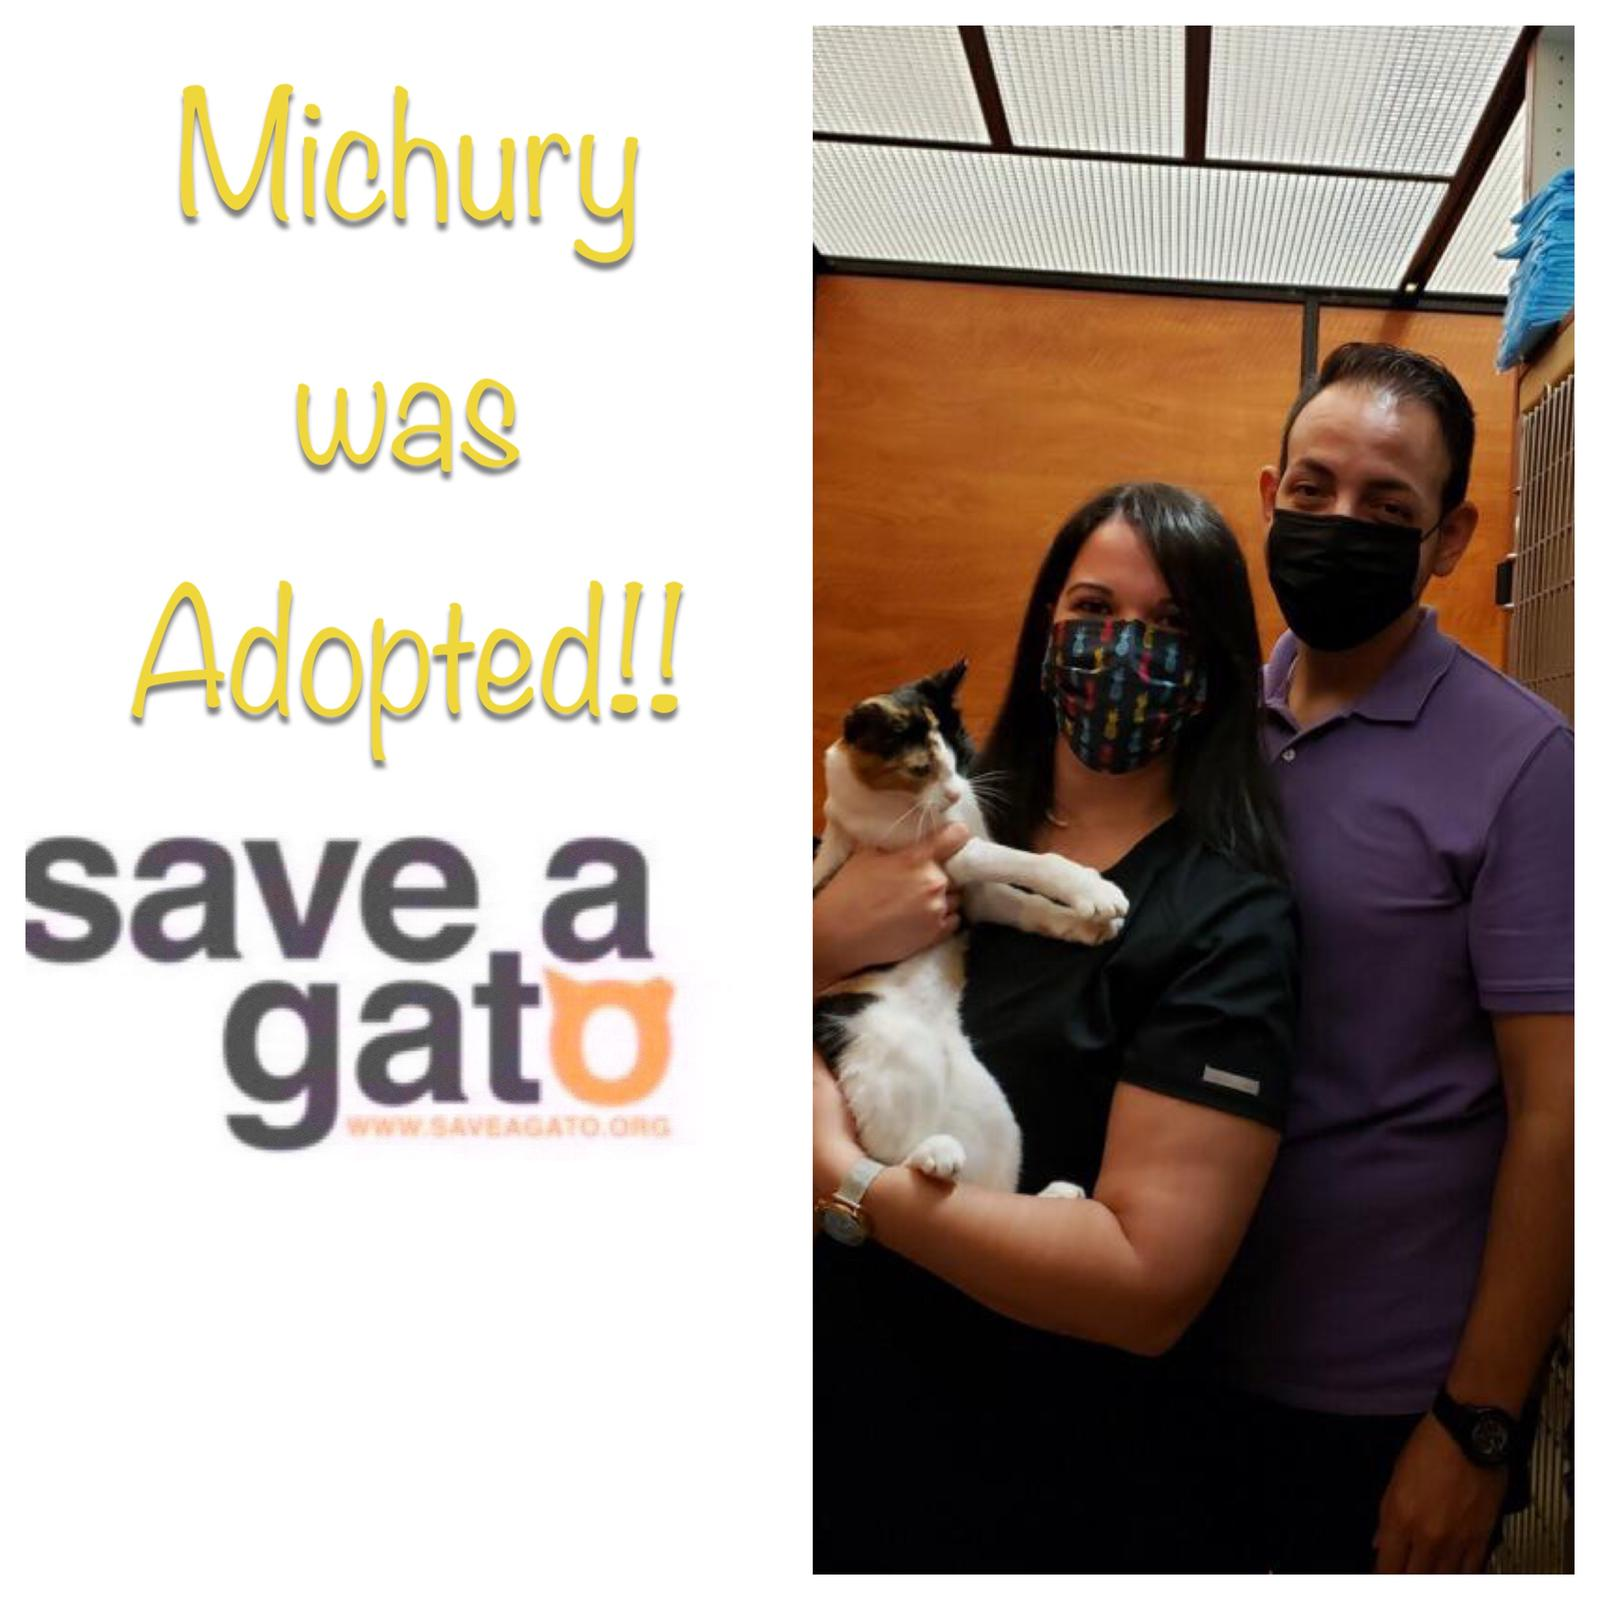 Michury